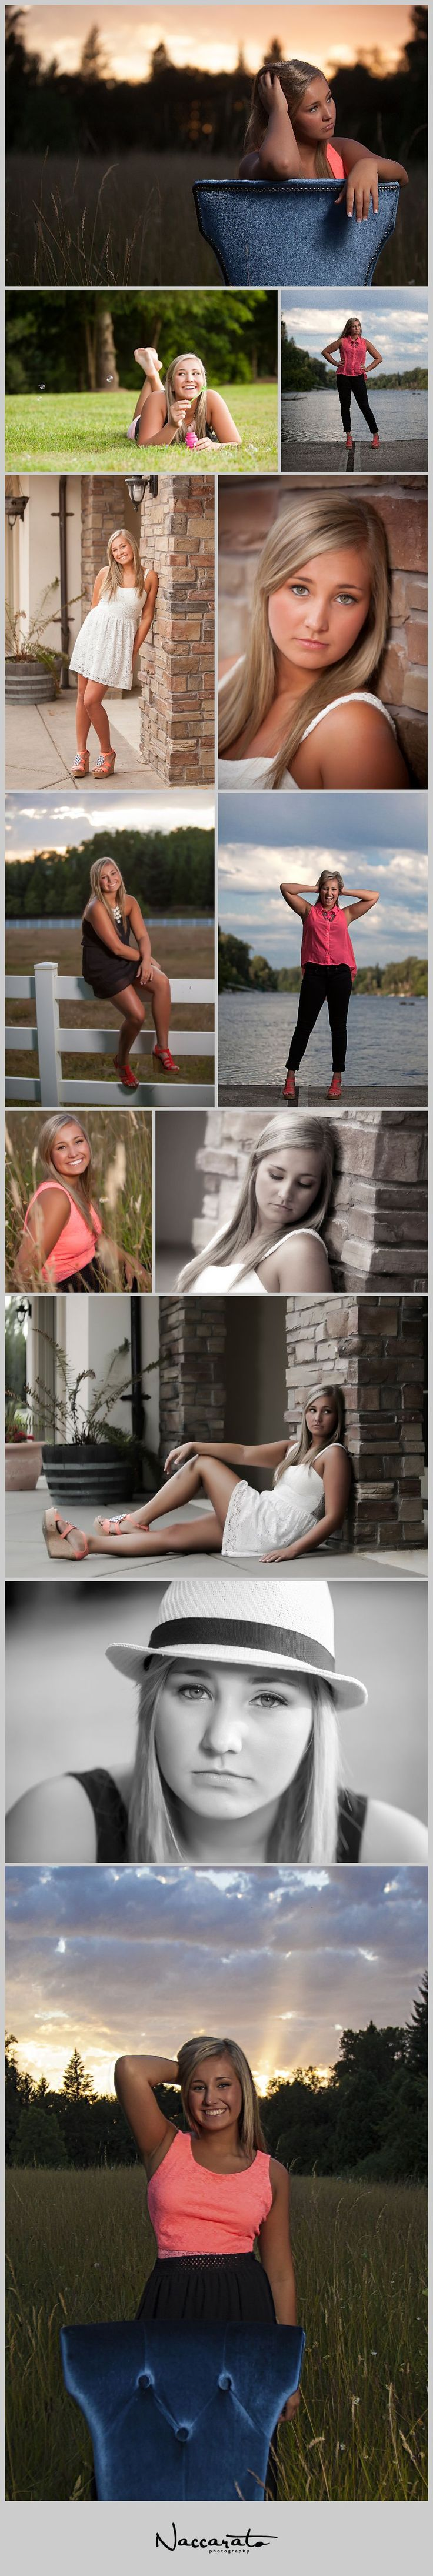 Abbie's Senior Pictures | Oregon City High School. Poses for Senior Girls. Naccarato Photography. Bailey